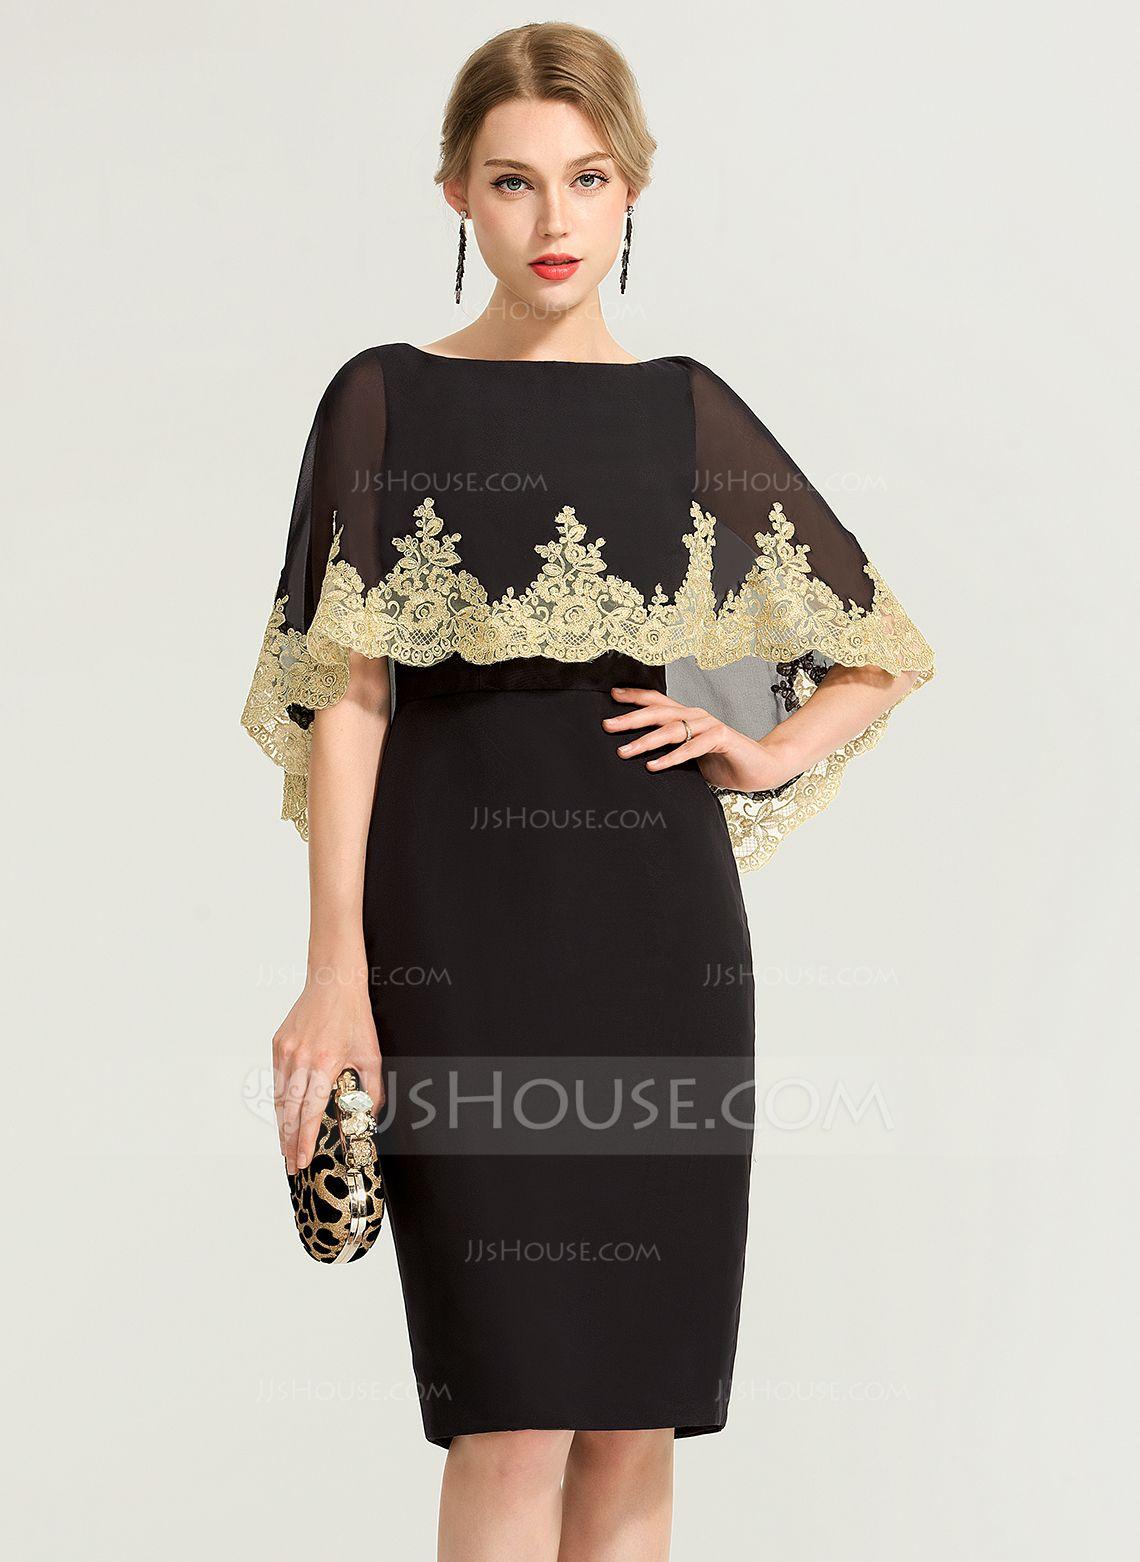 Us 95 00 Sheath Column Scoop Neck Knee Length Chiffon Cocktail Dress With Lace Jj S House Chiffon Cocktail Dress Lace Dress Event Dresses [ 1562 x 1140 Pixel ]